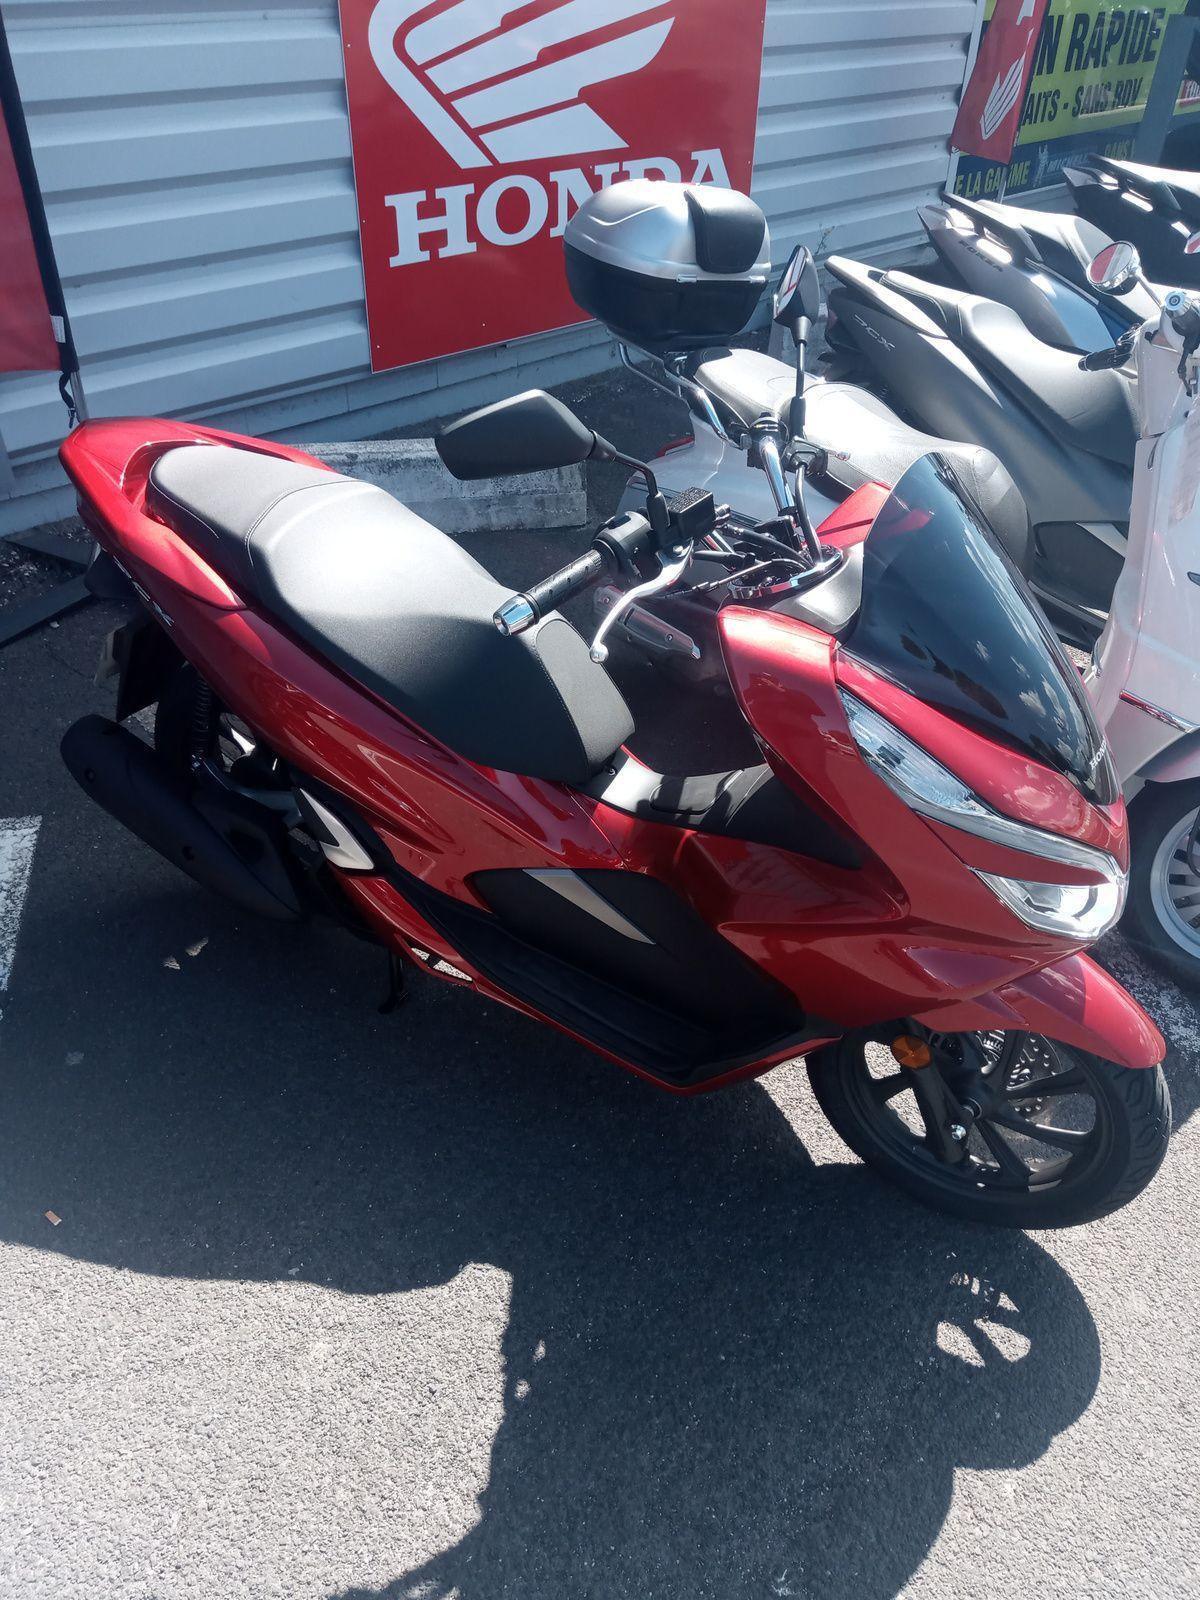 scooter honda pcx 125 pour rodage (scooter urbain)